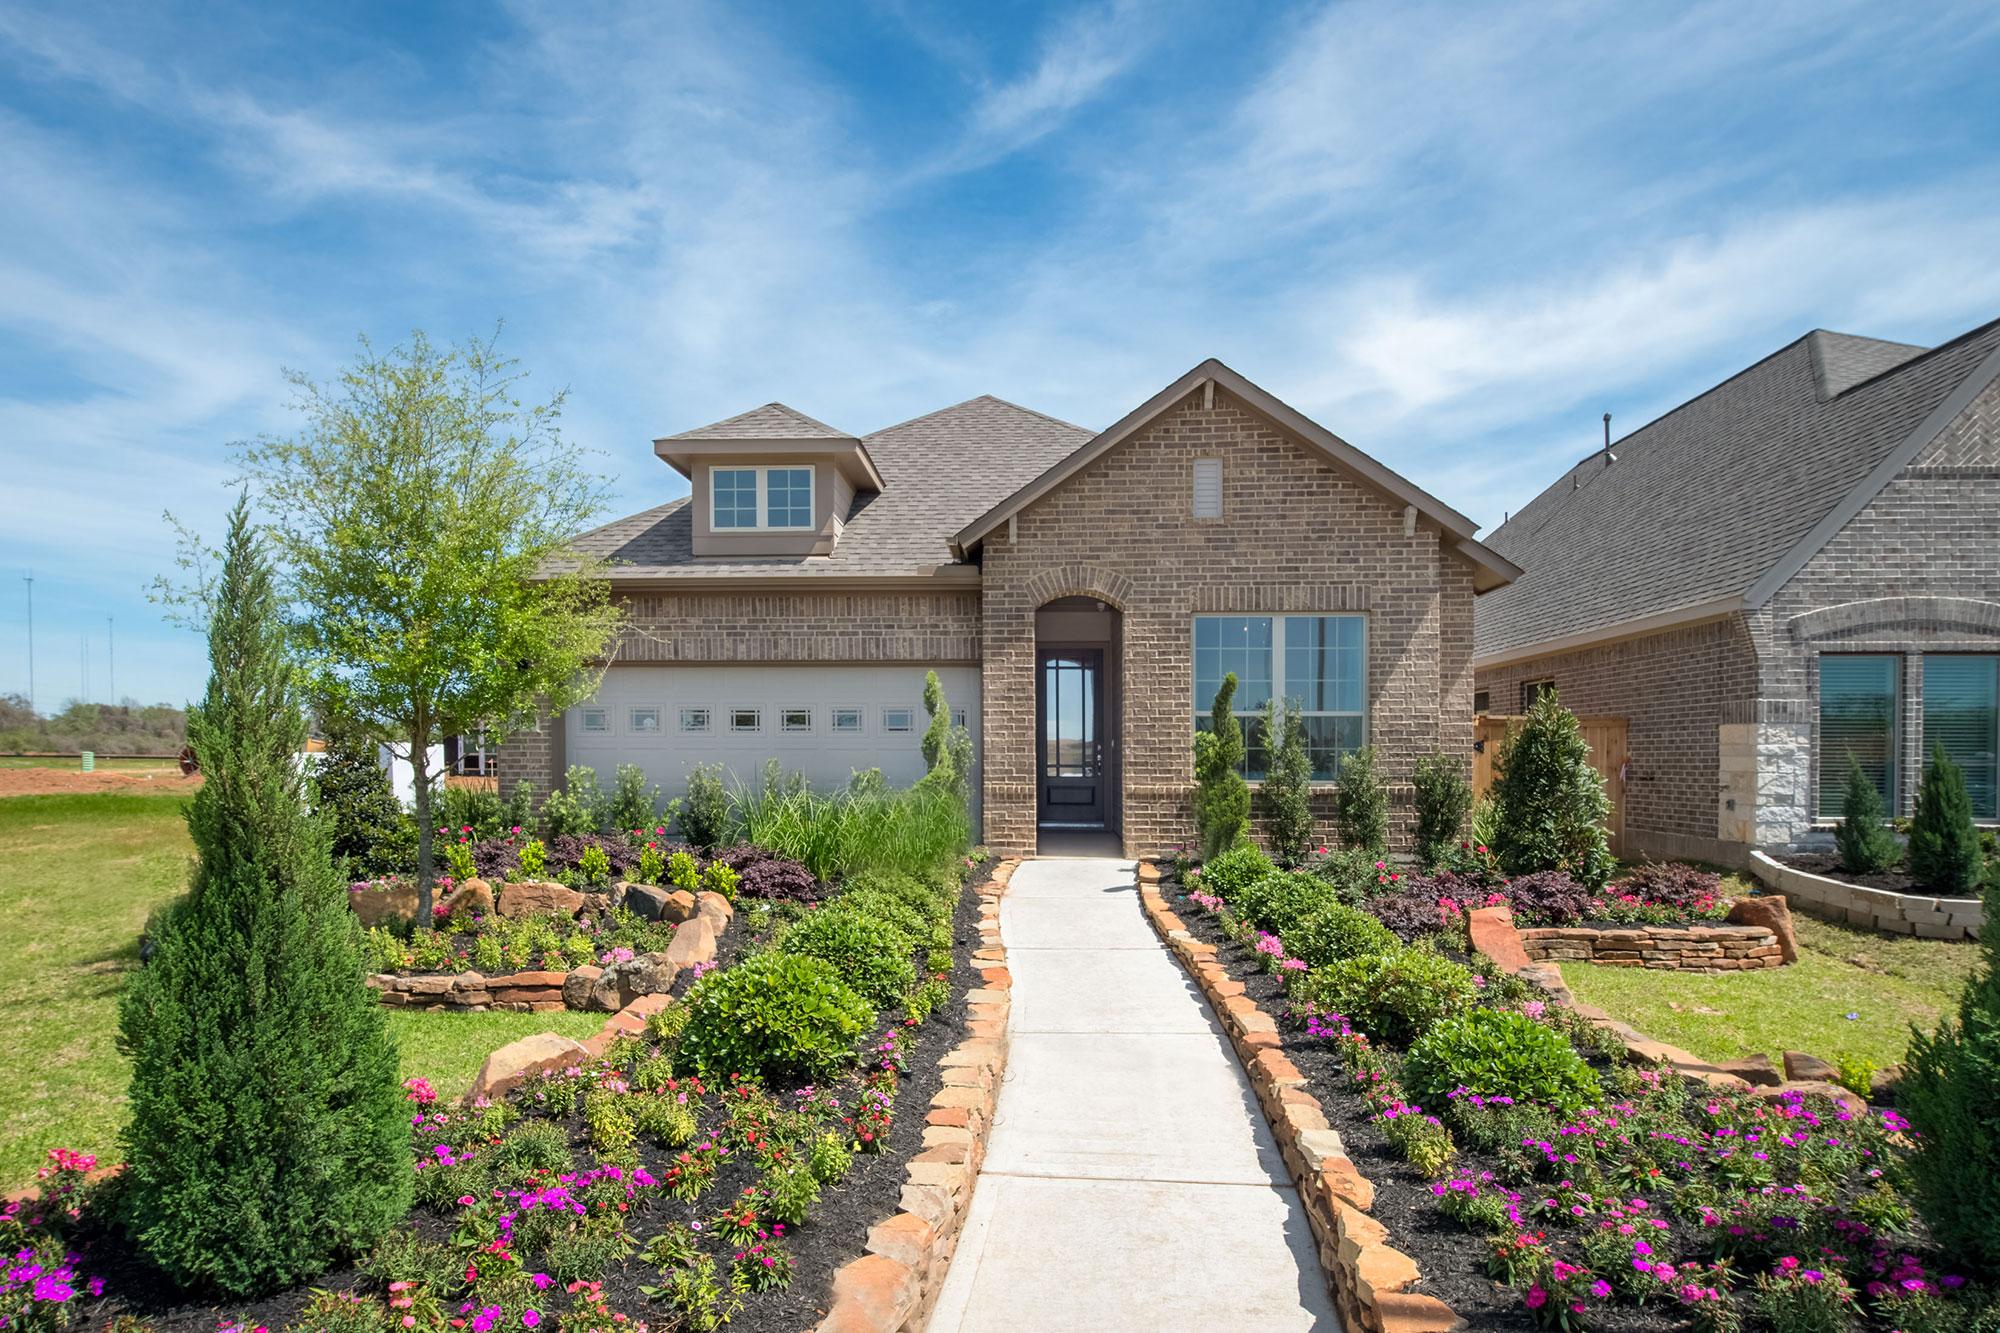 Sienna Plantation   Leafwing Meadow 45u0027 Missouri City TX Home Builder, New  Homes   David Weekley Homes